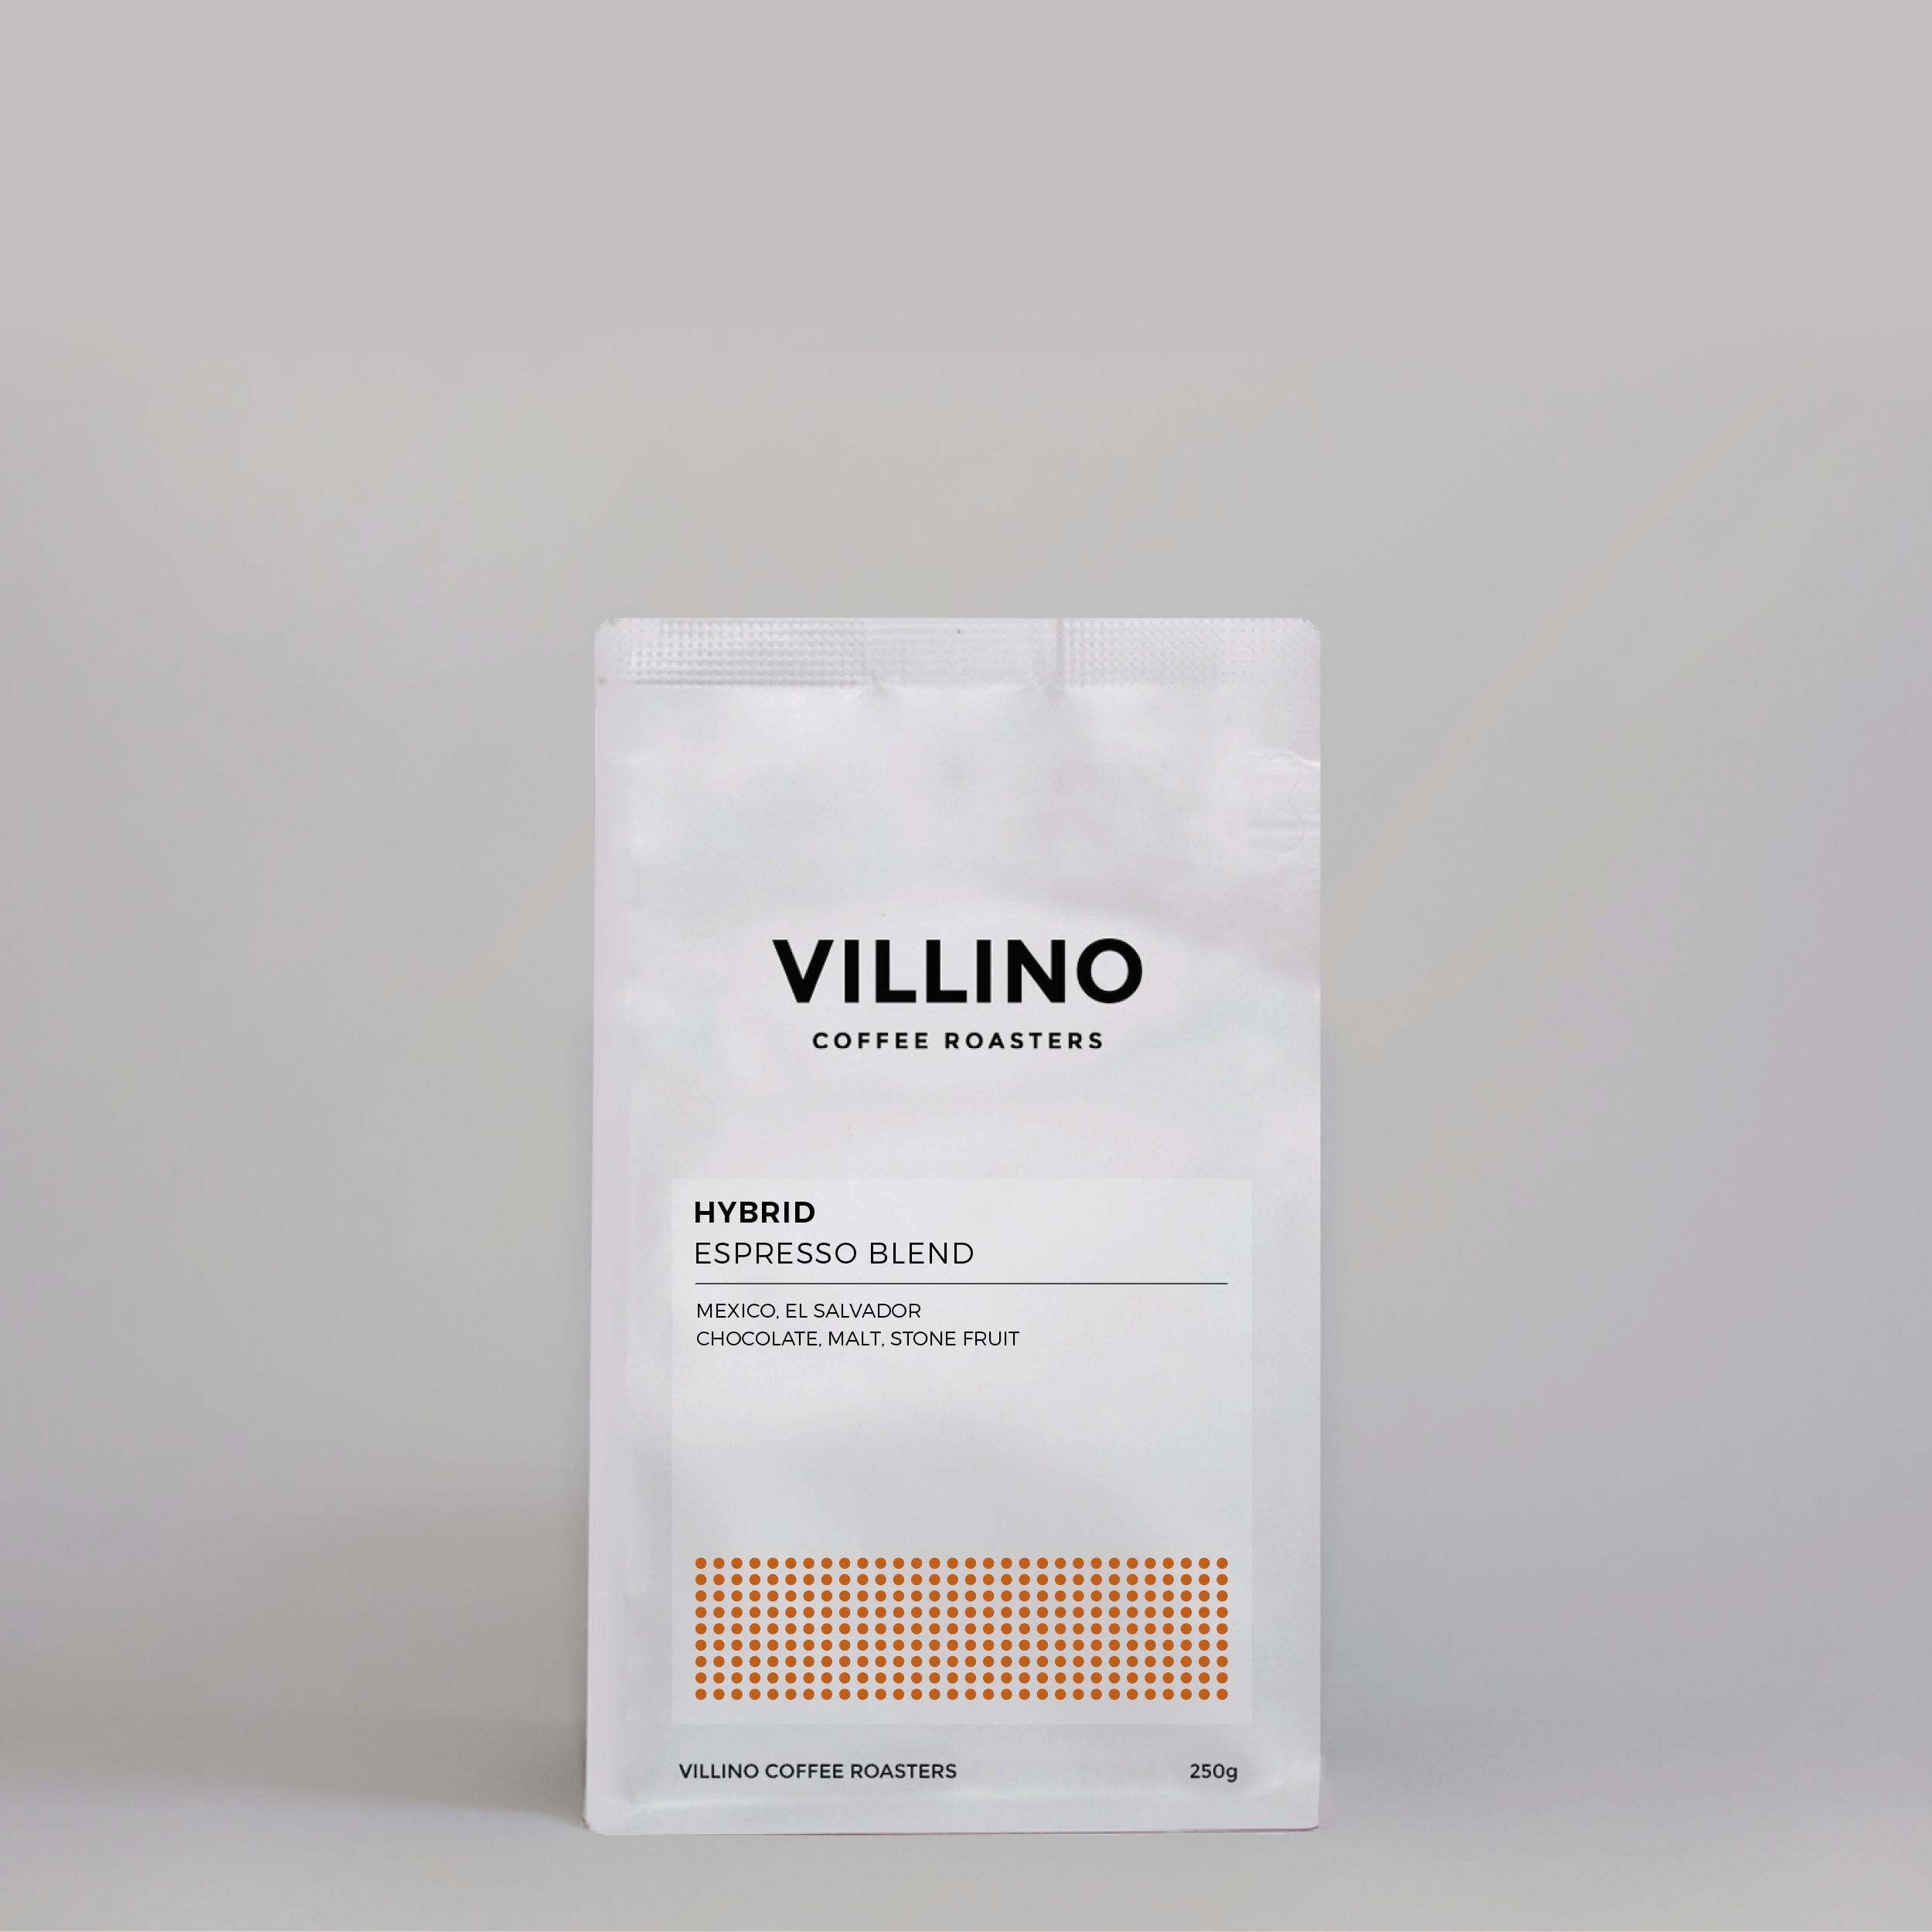 Villino_Retail Bag Templates_600x600px7.png